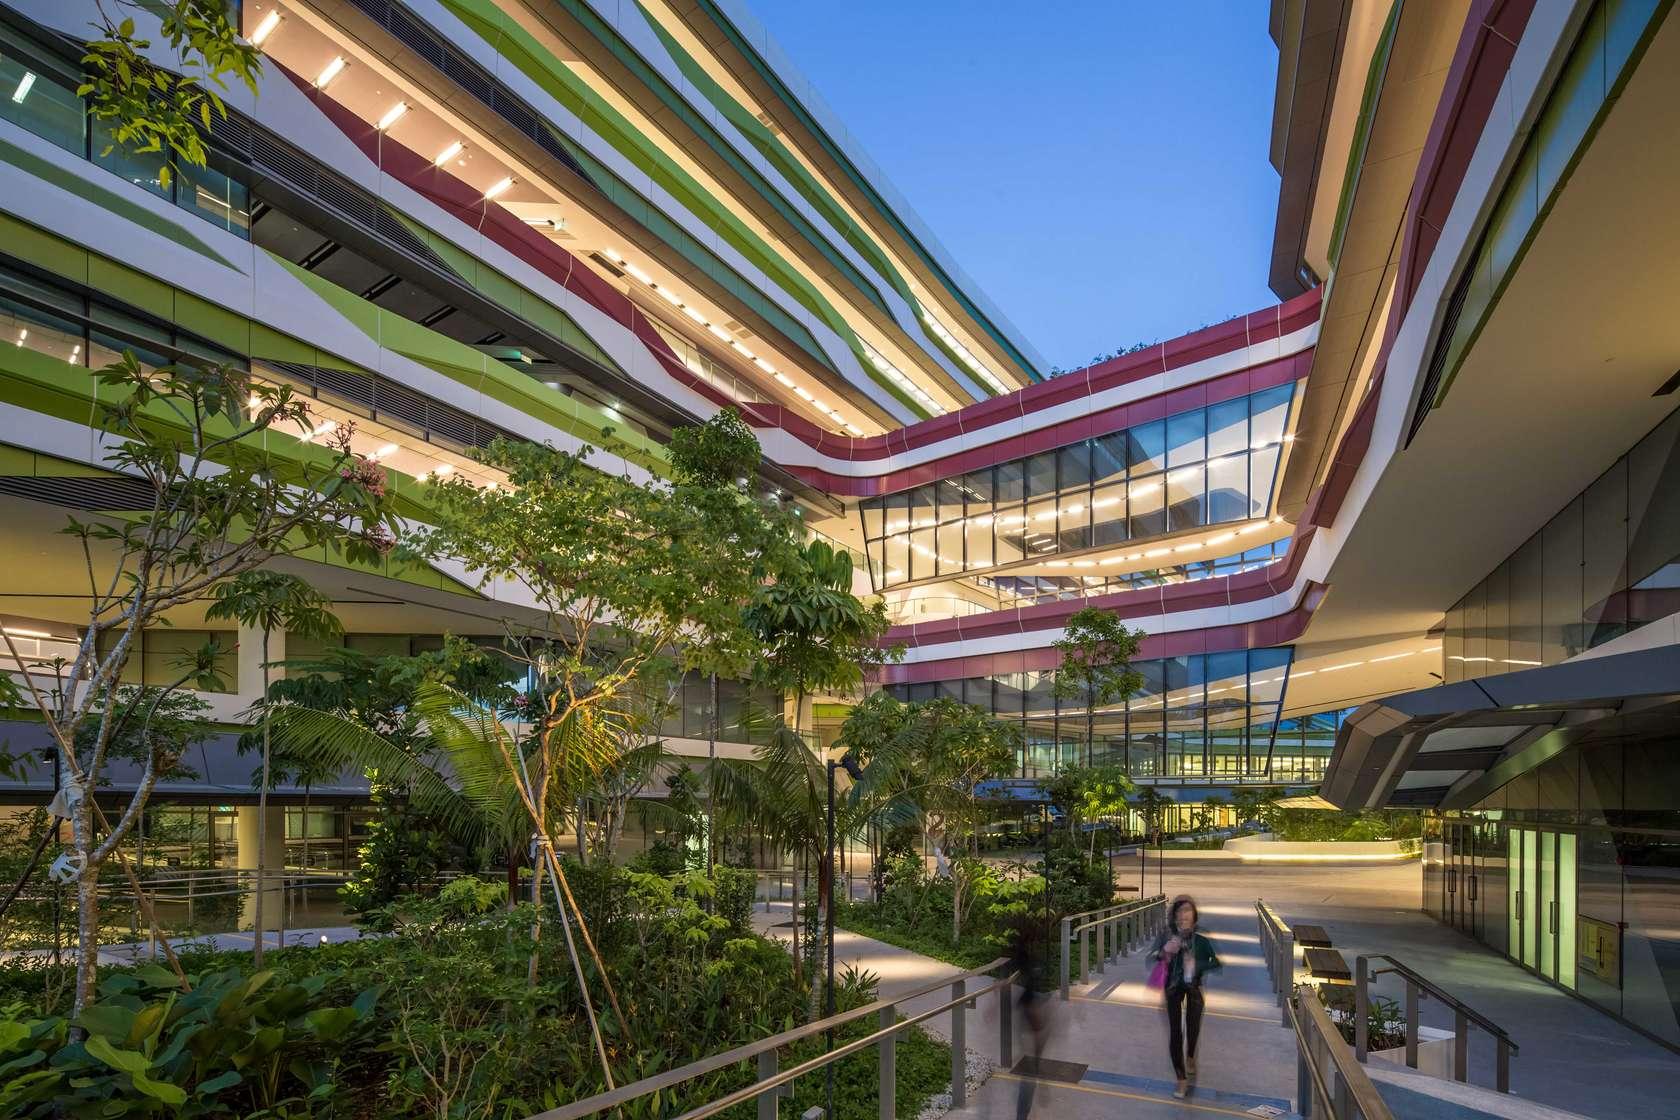 Singapore university of technology and design architizer for Technology architecture design